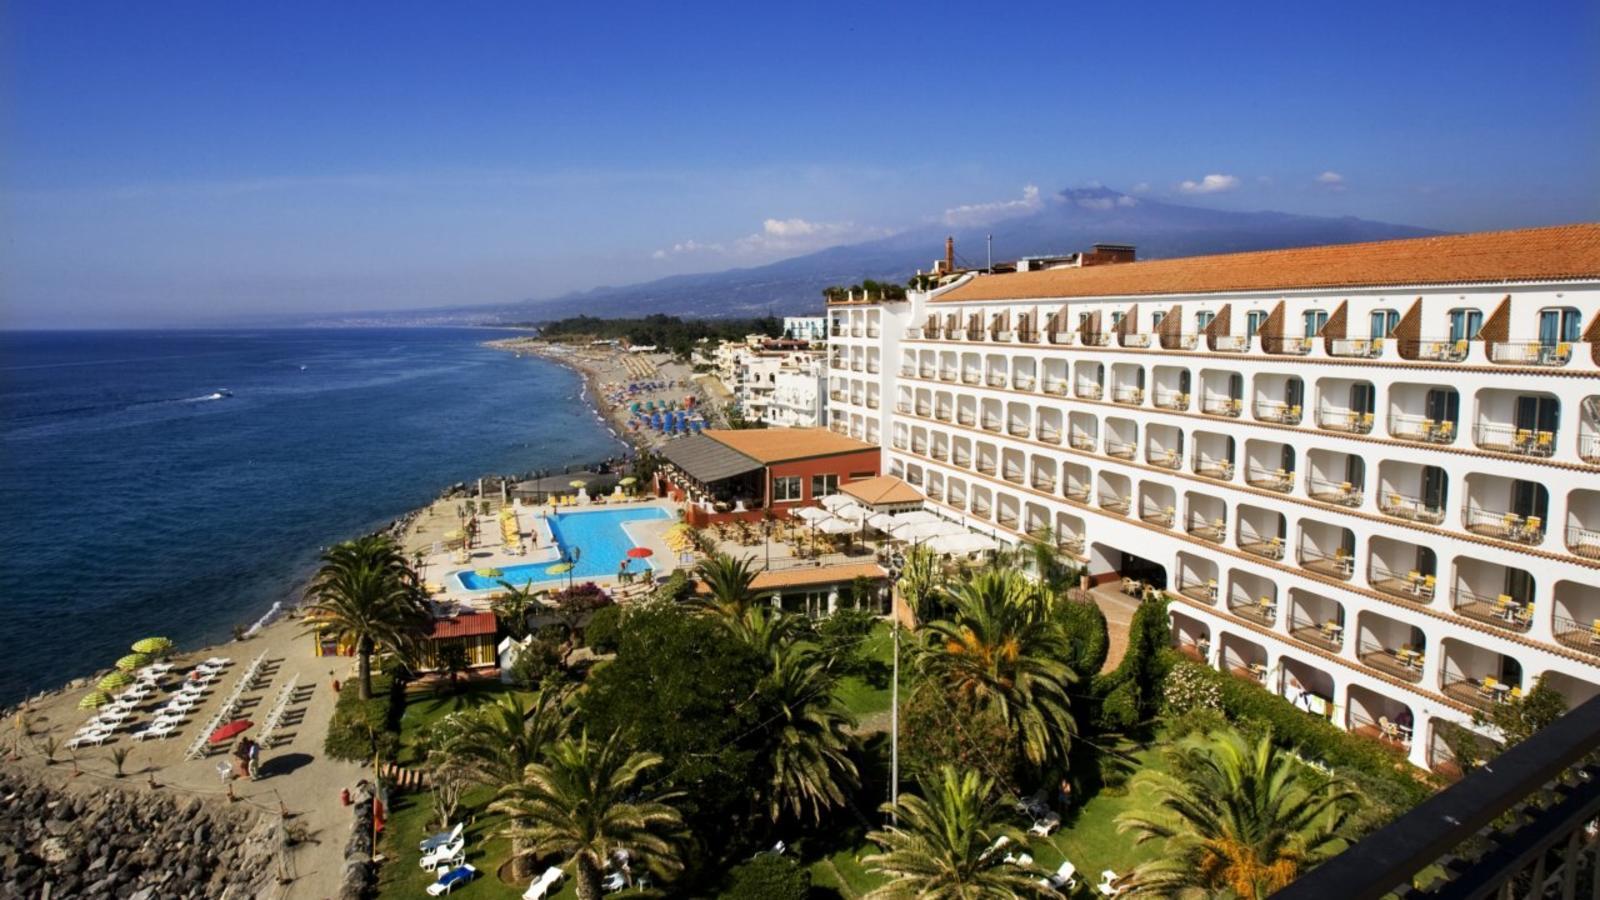 Hotel hilton giardini naxos sicily holidays for Giardini naxos sicilia